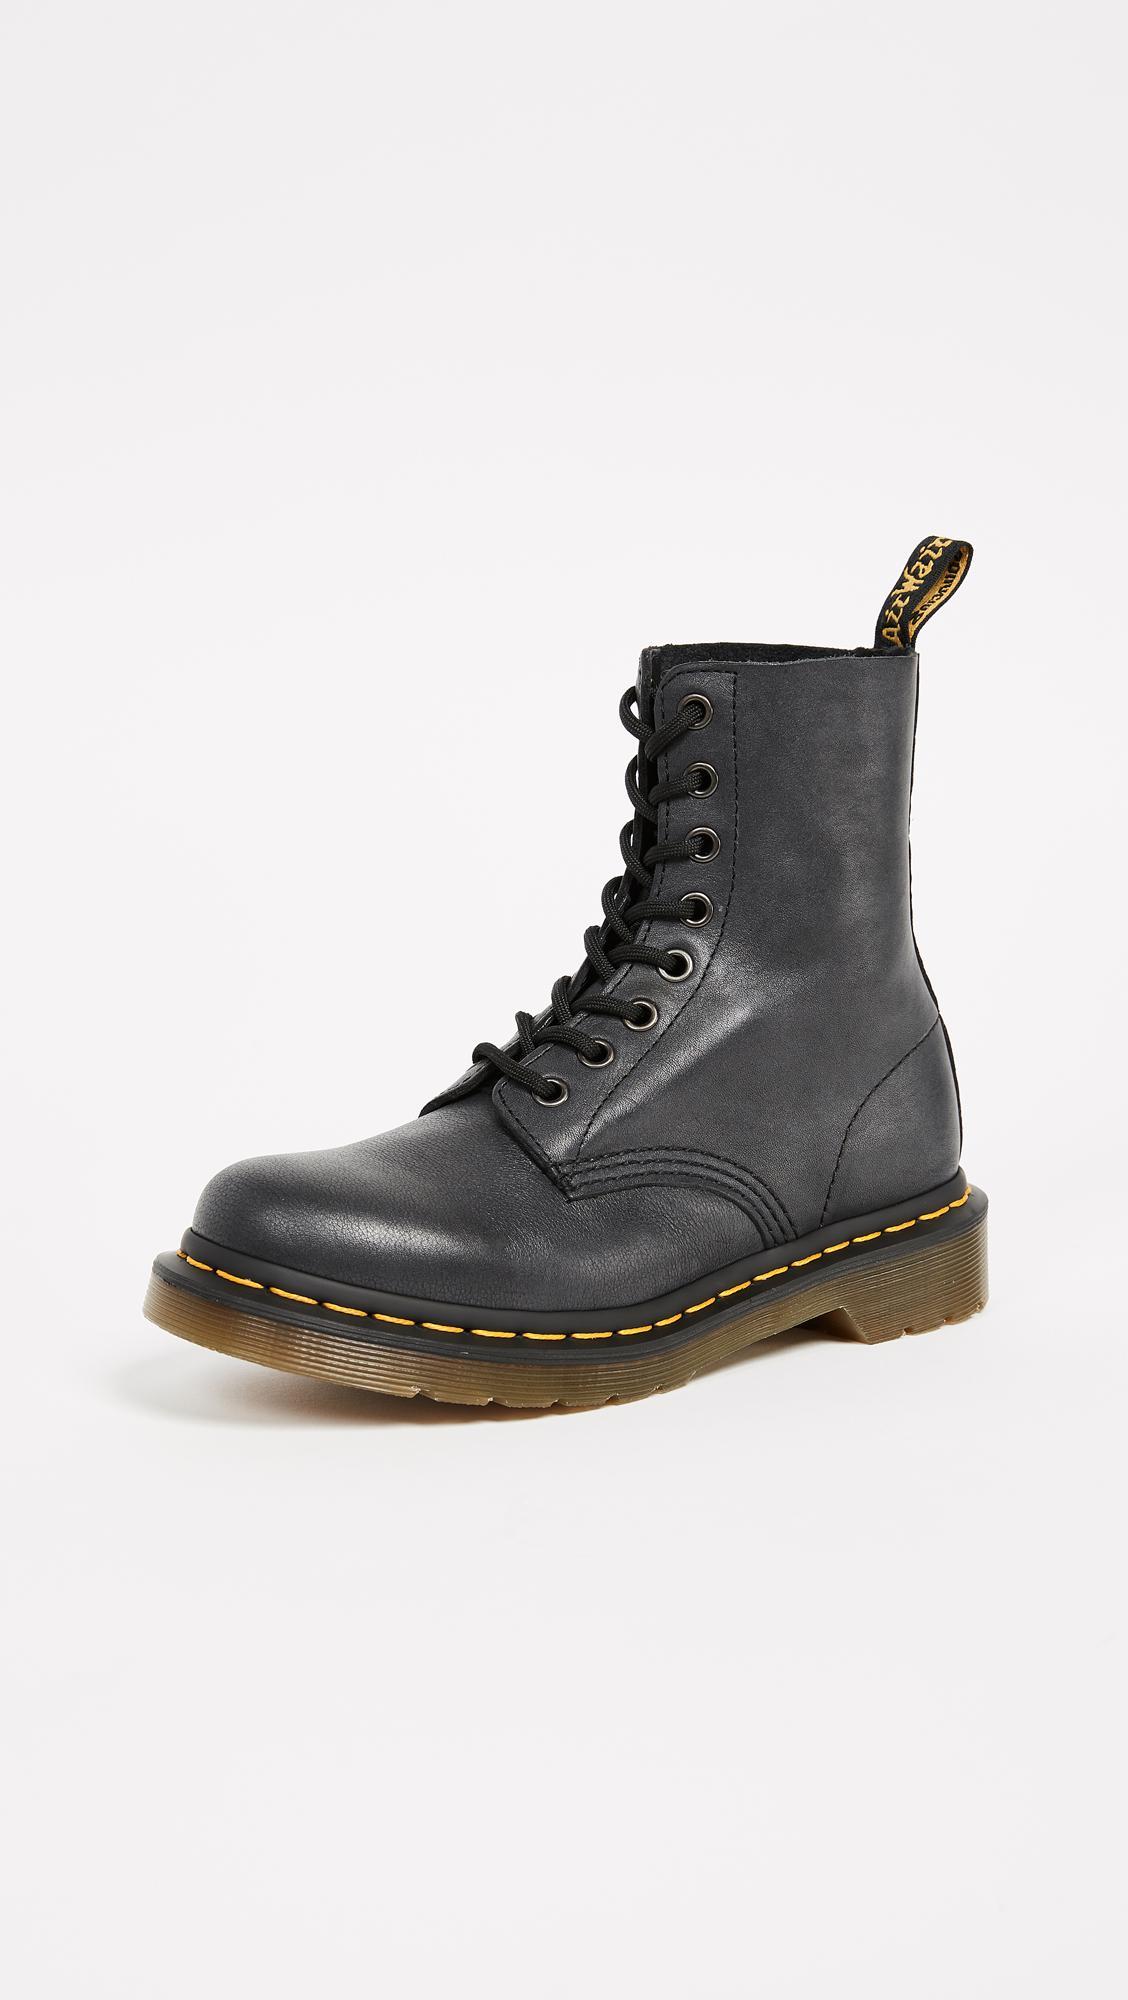 Emilio Pucci Black Patent 1460 Boots 9t2LmCt